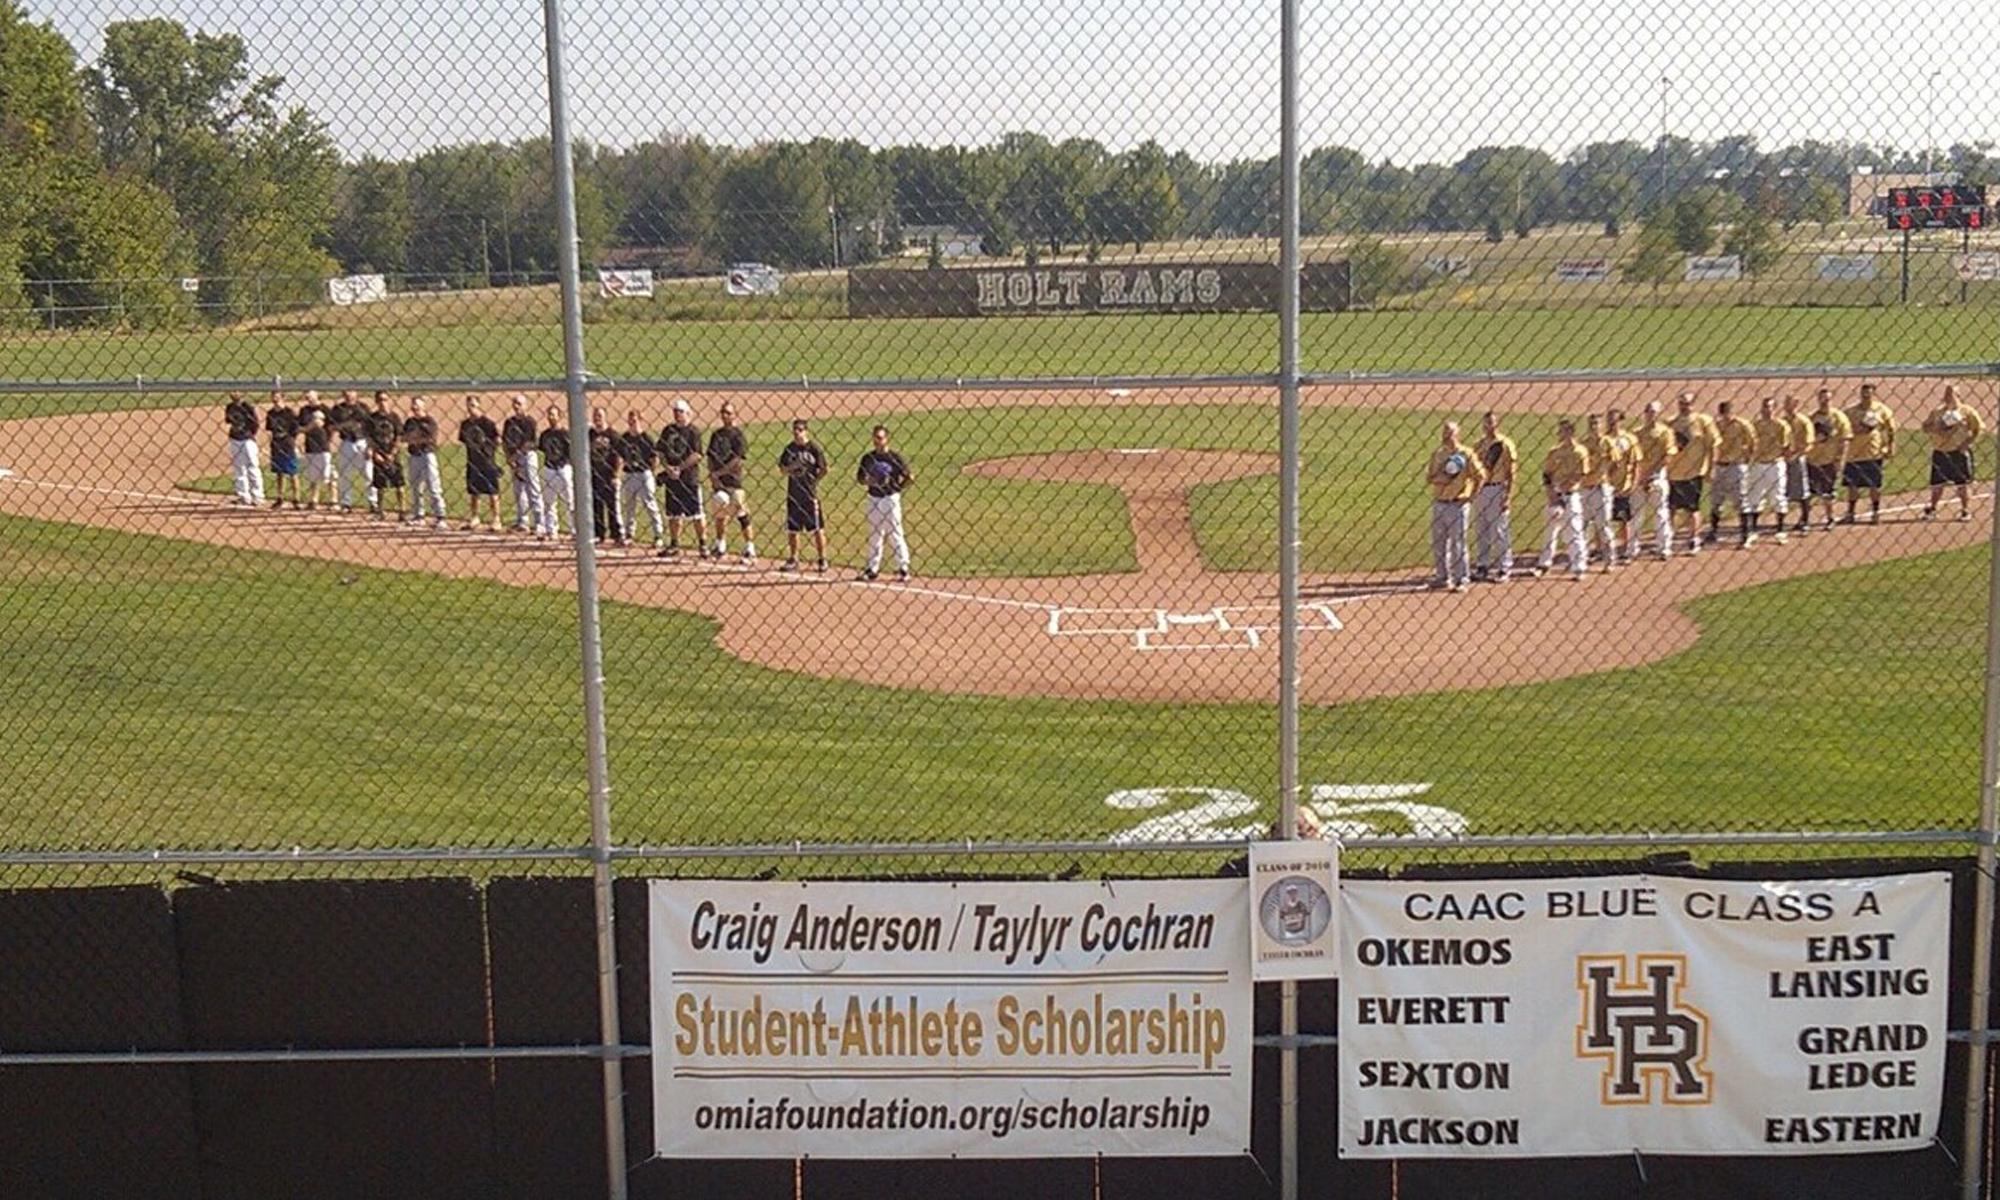 25 Taylyr Cochran Baseball Field